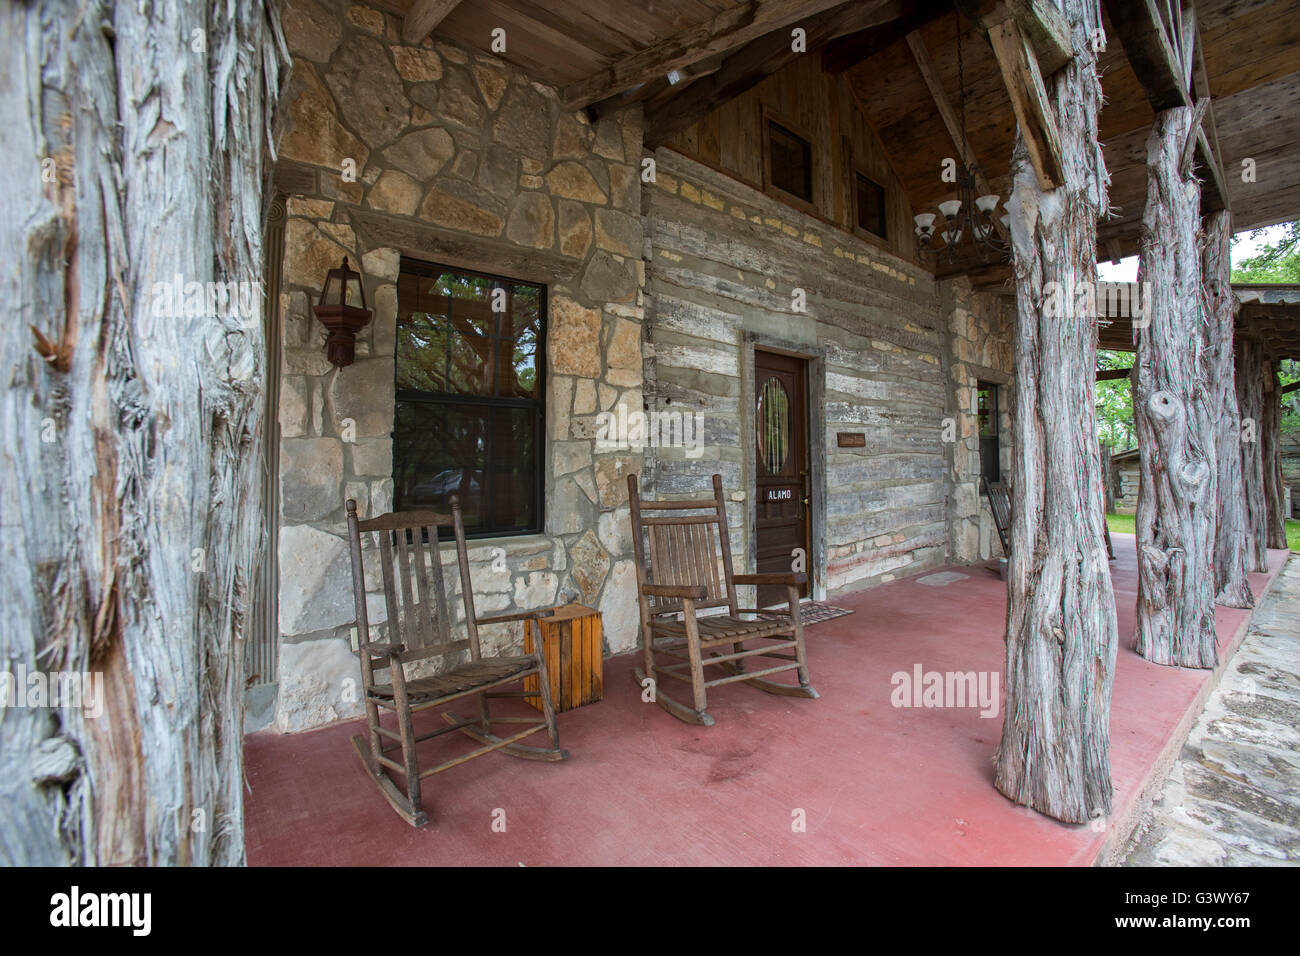 Texas log cabin on ranch - Stock Image